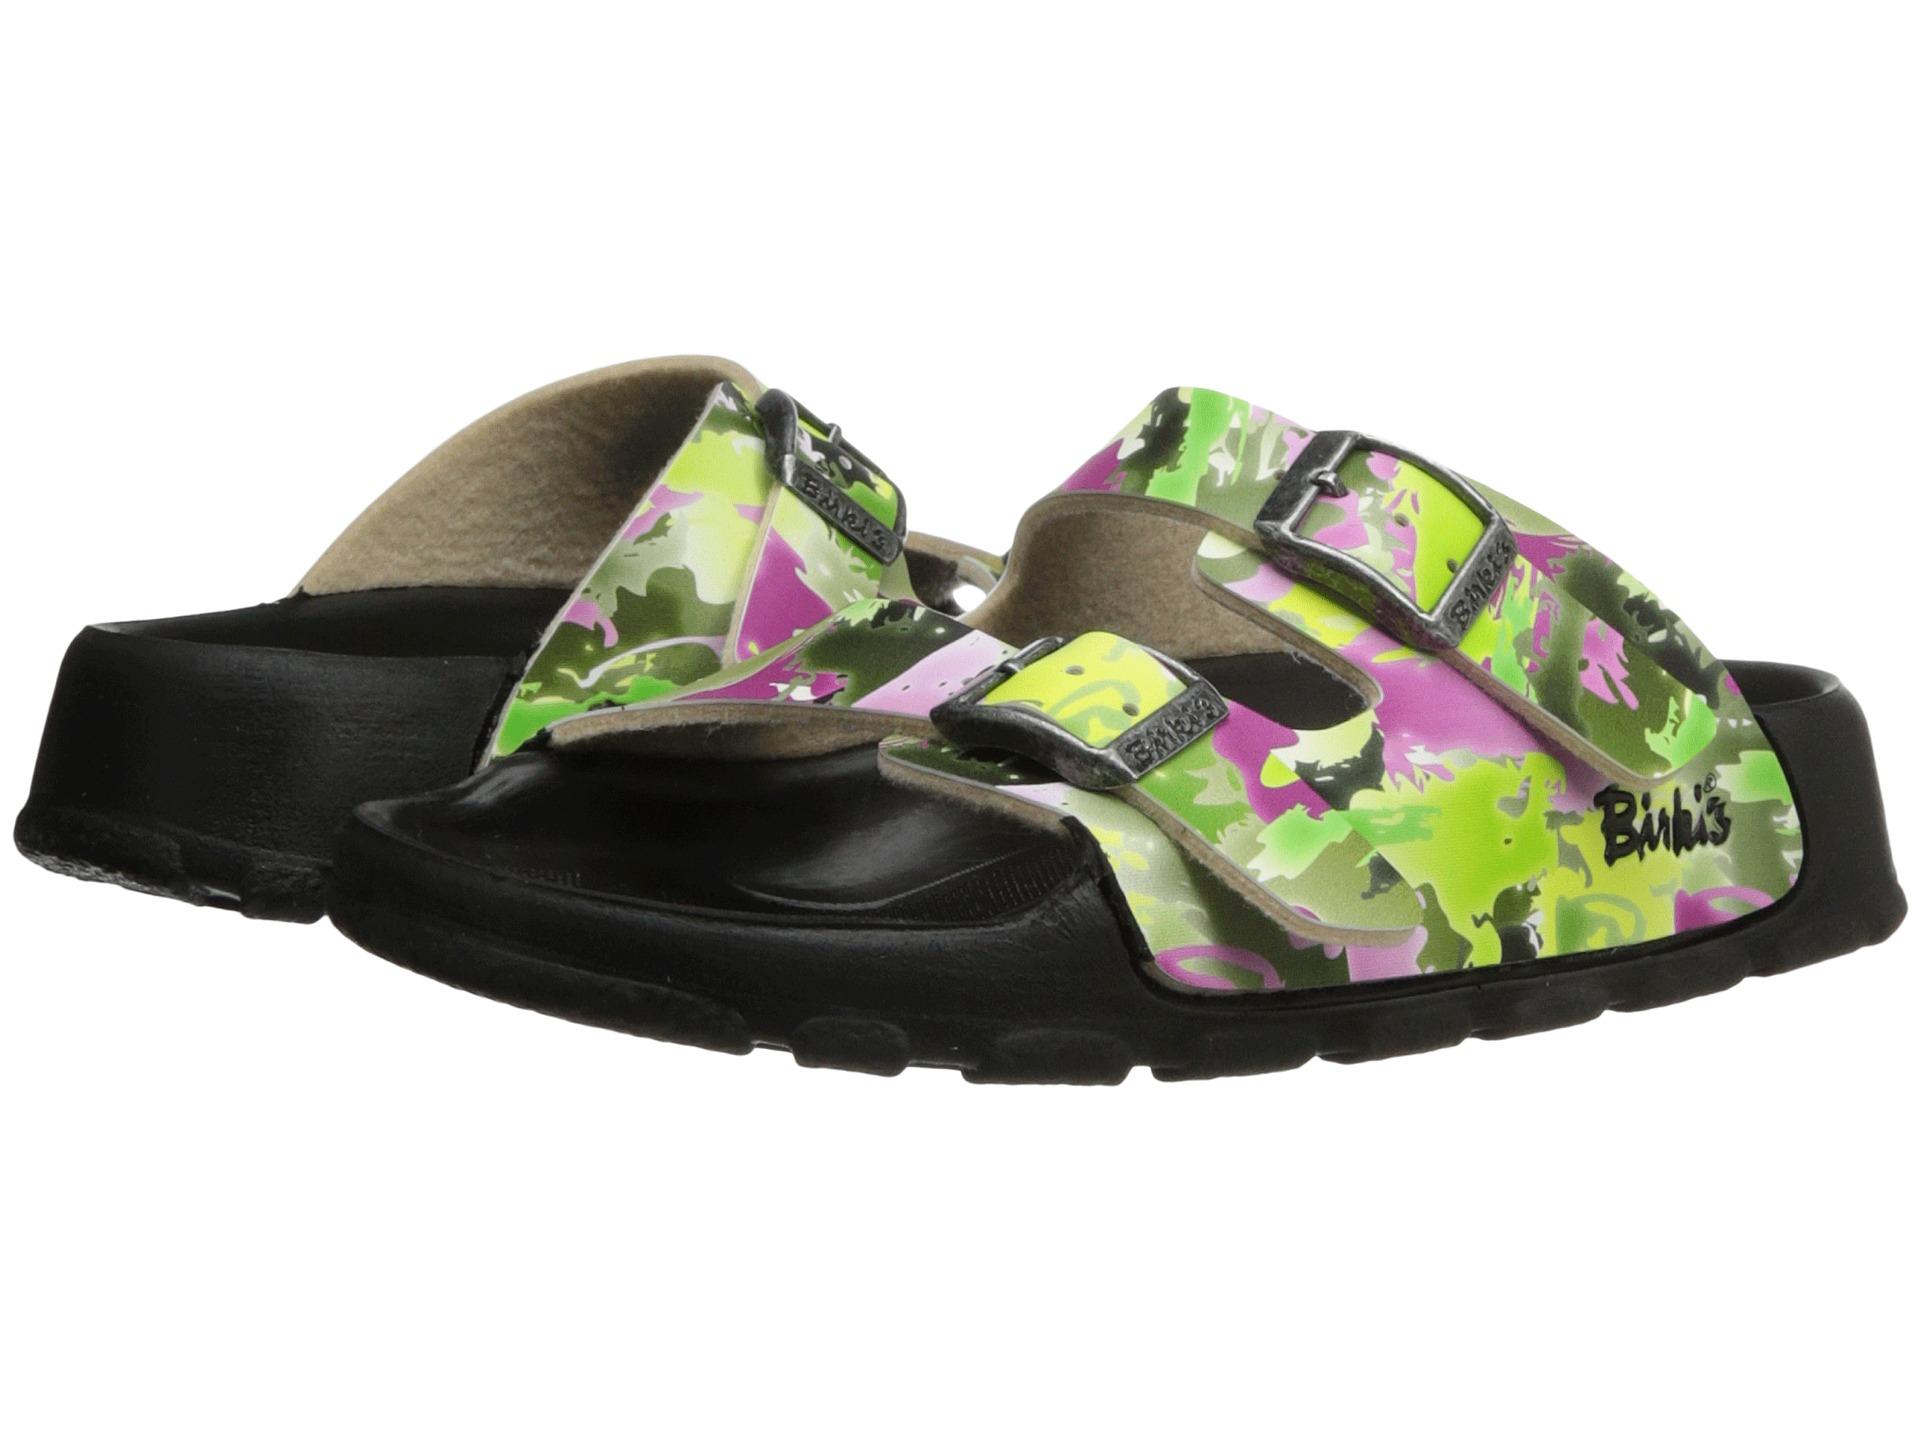 Kids Birkenstock Clearance Hippie Sandals